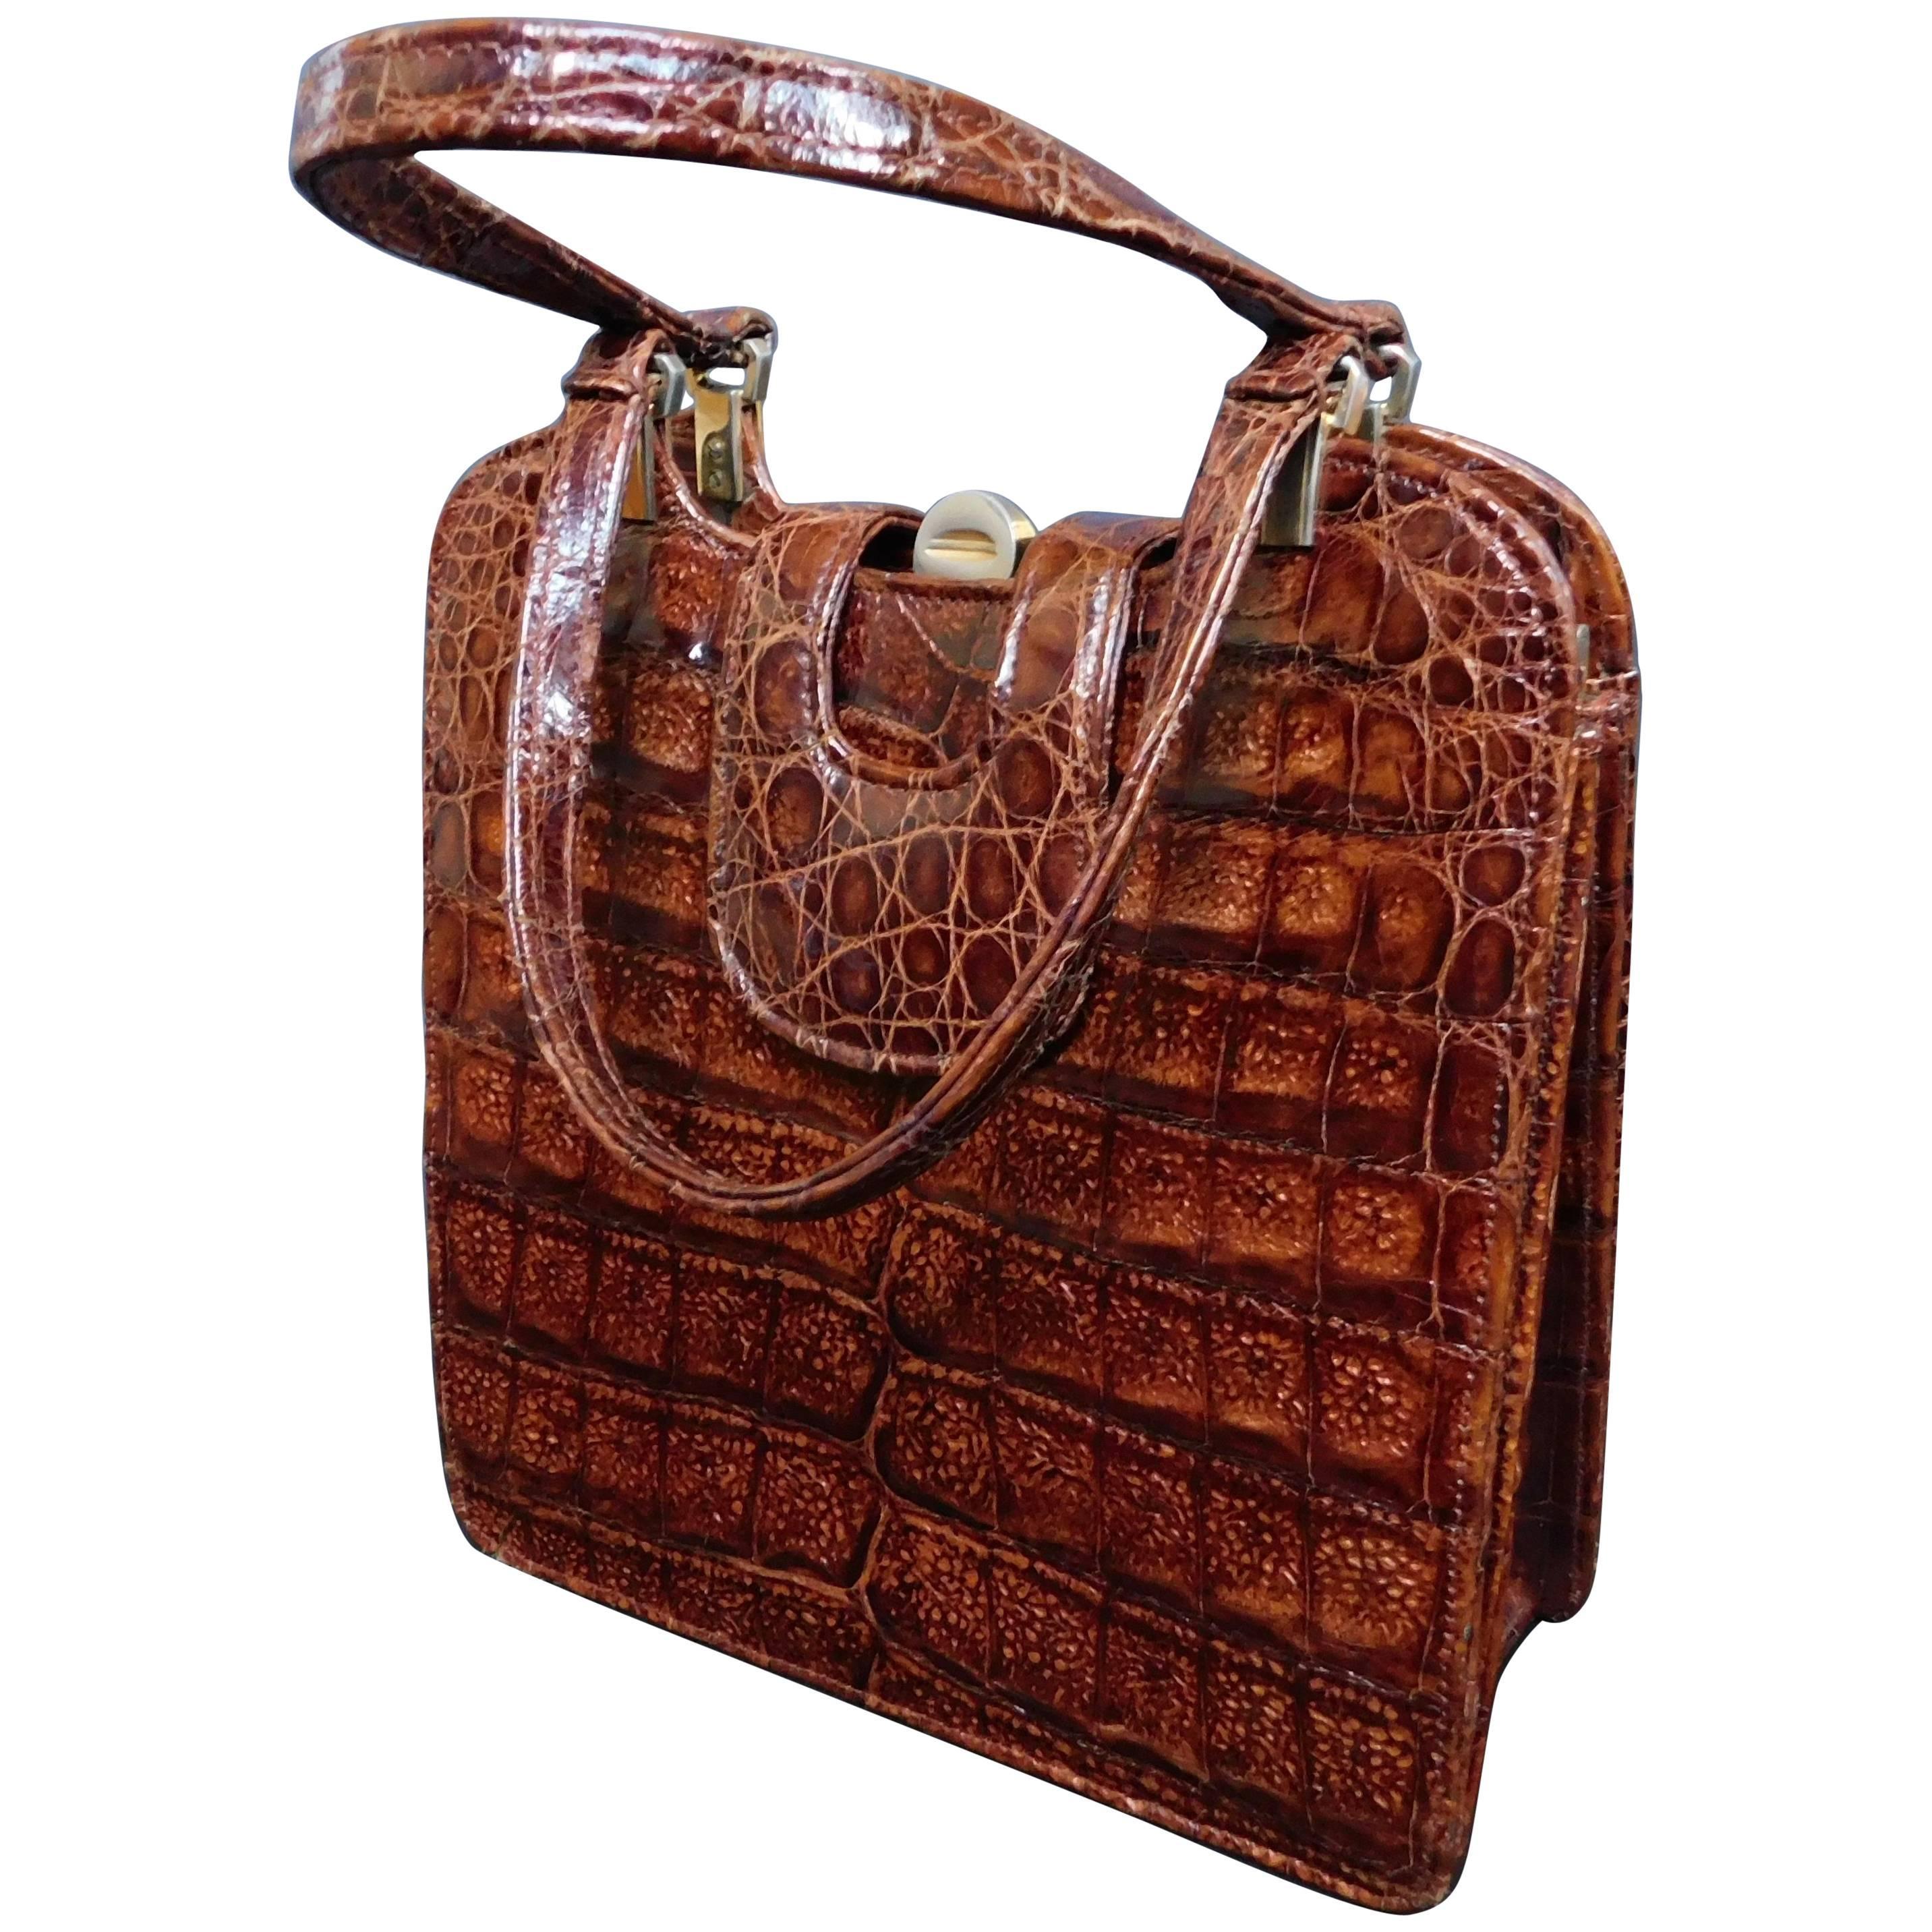 1stdibs Vintage Carmel Crocodile Skin Handbag vA4YpwLGG